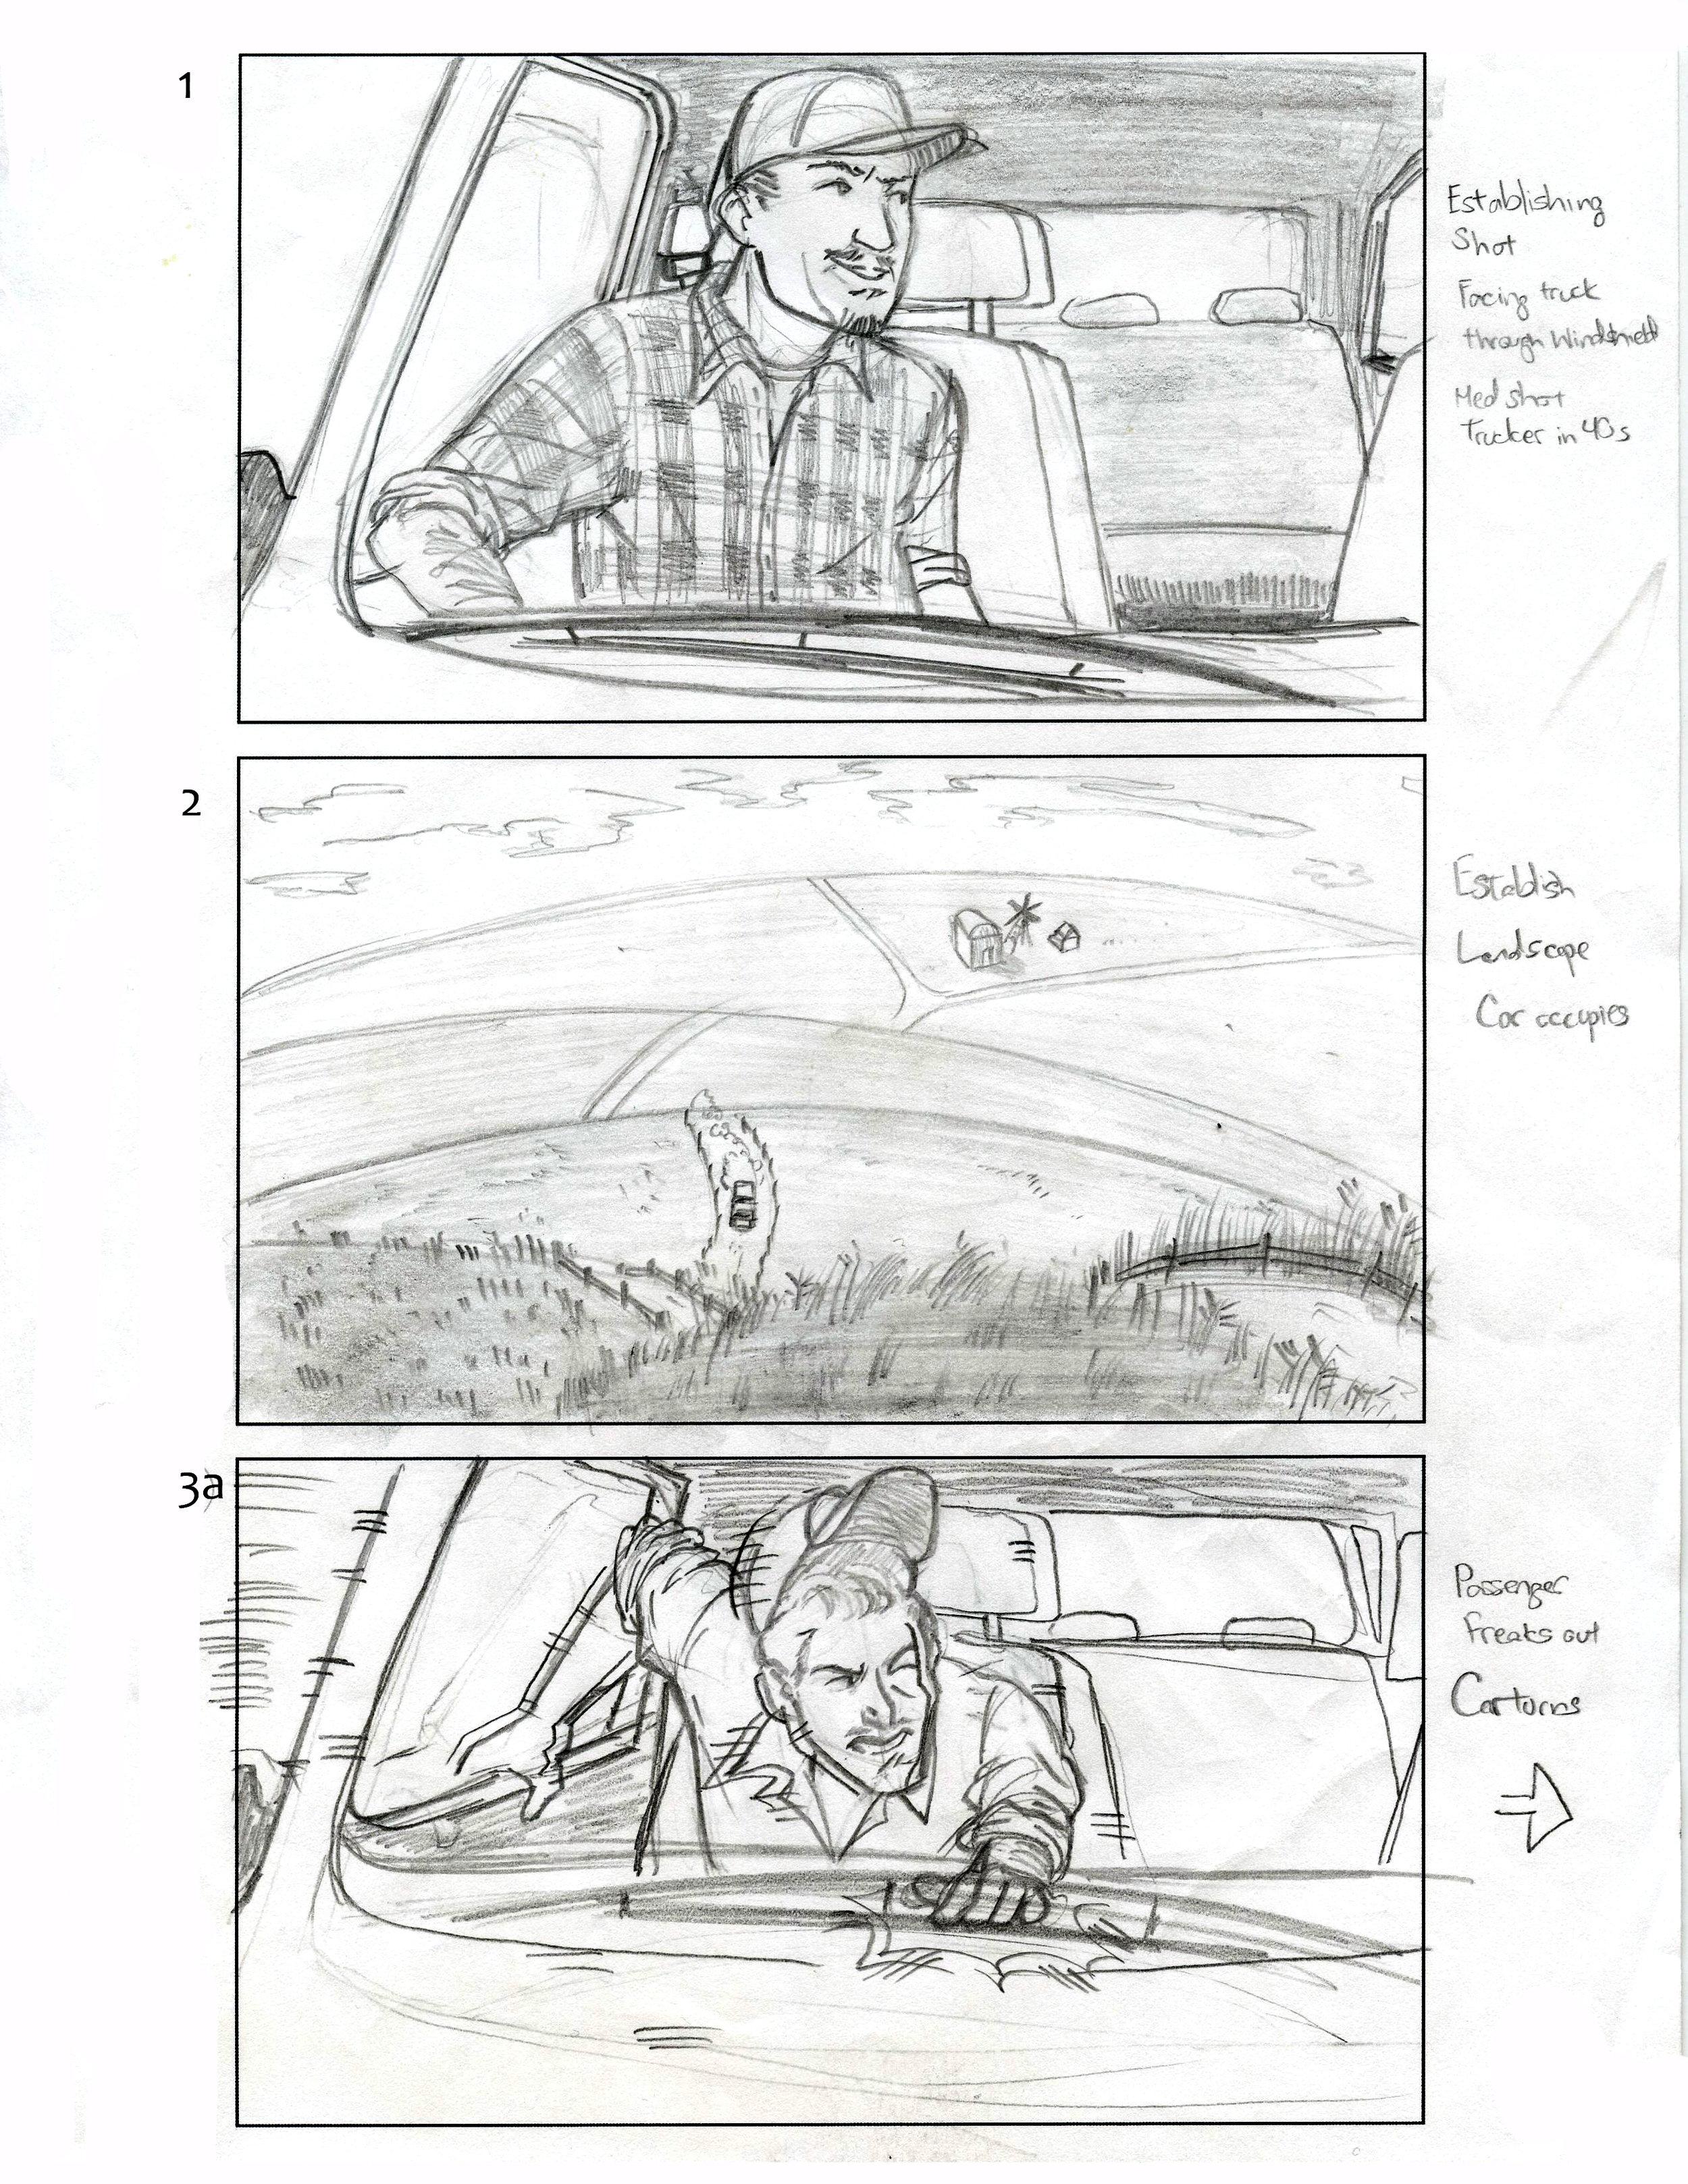 Storyboard2_1-3a.jpg